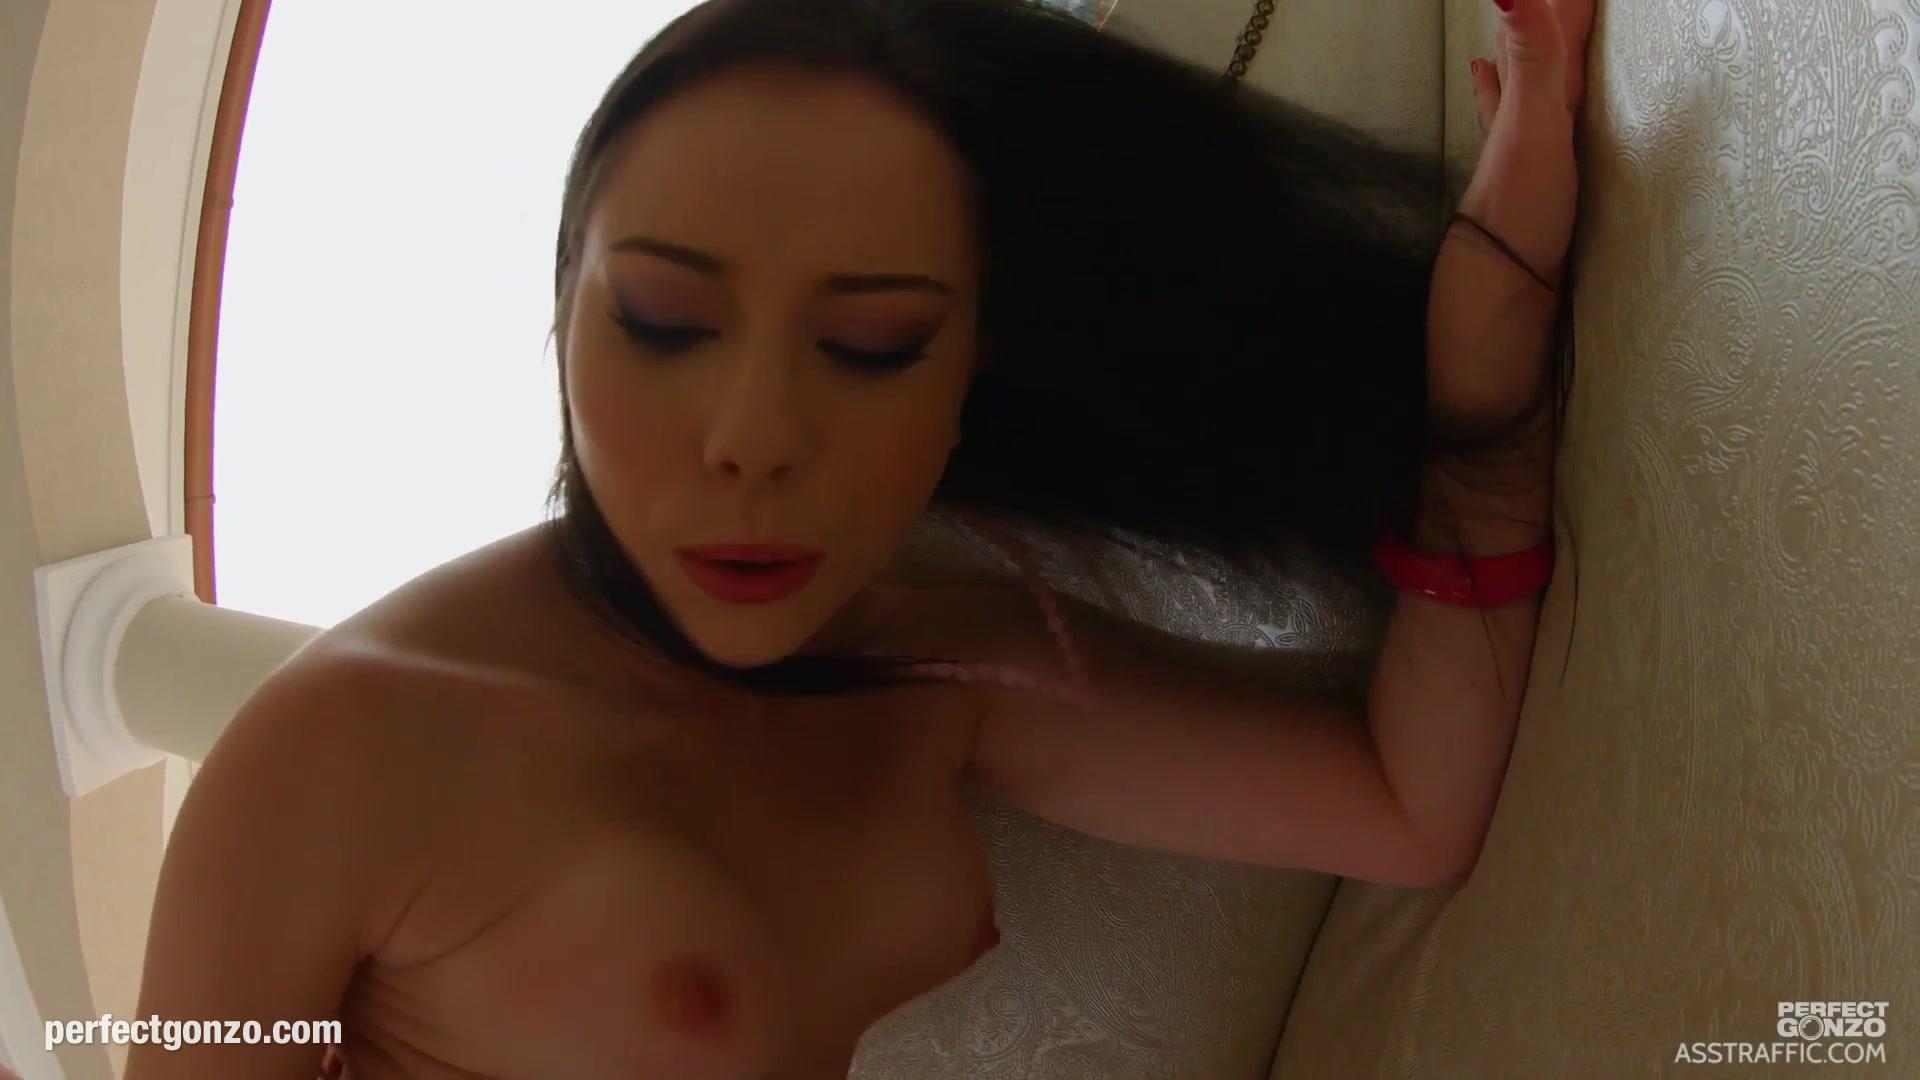 Sex photo Good looking girl porn